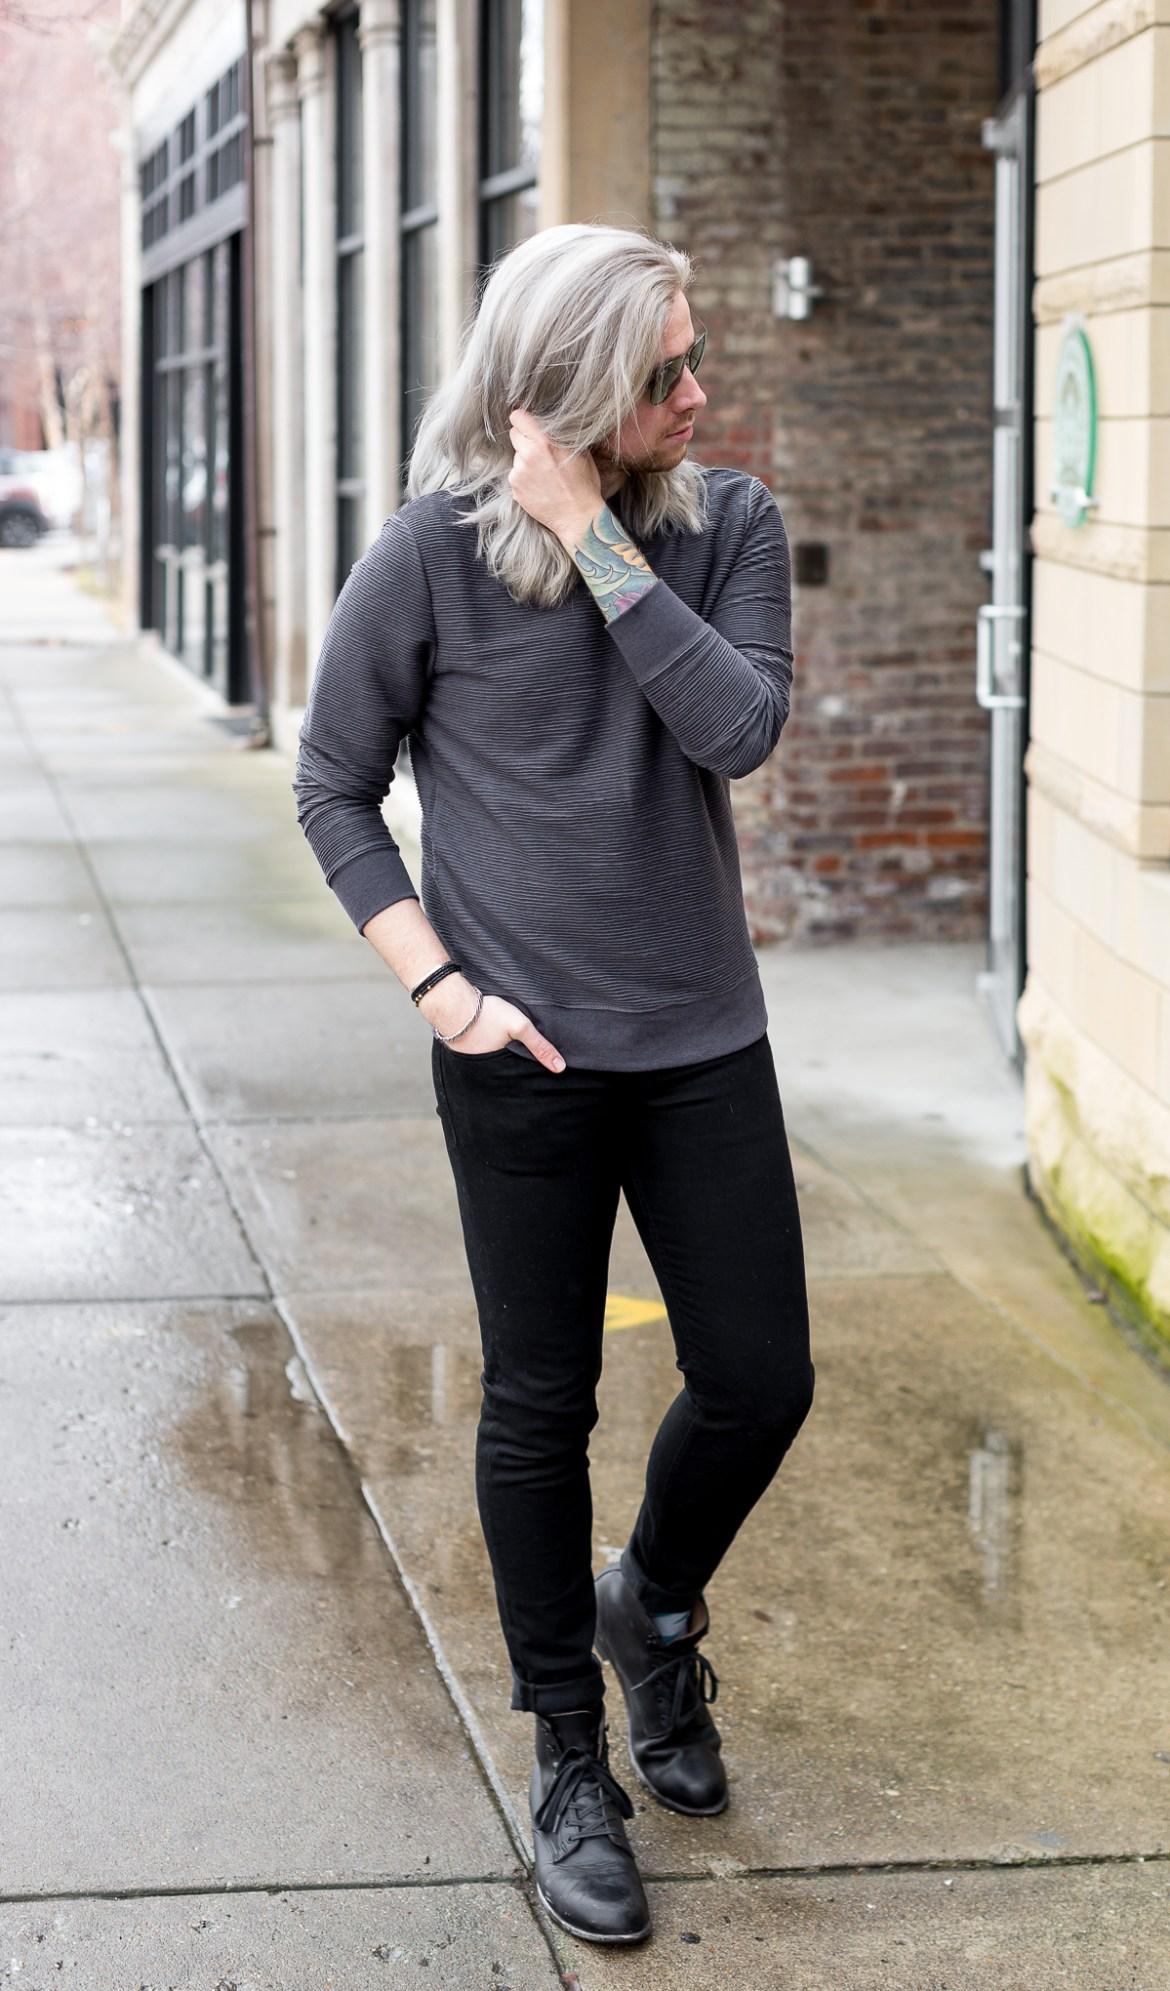 hm sweatshirt, mens affordable style, louisville blogger, kentucky blogger, mens blogger via @TheKentuckyGent